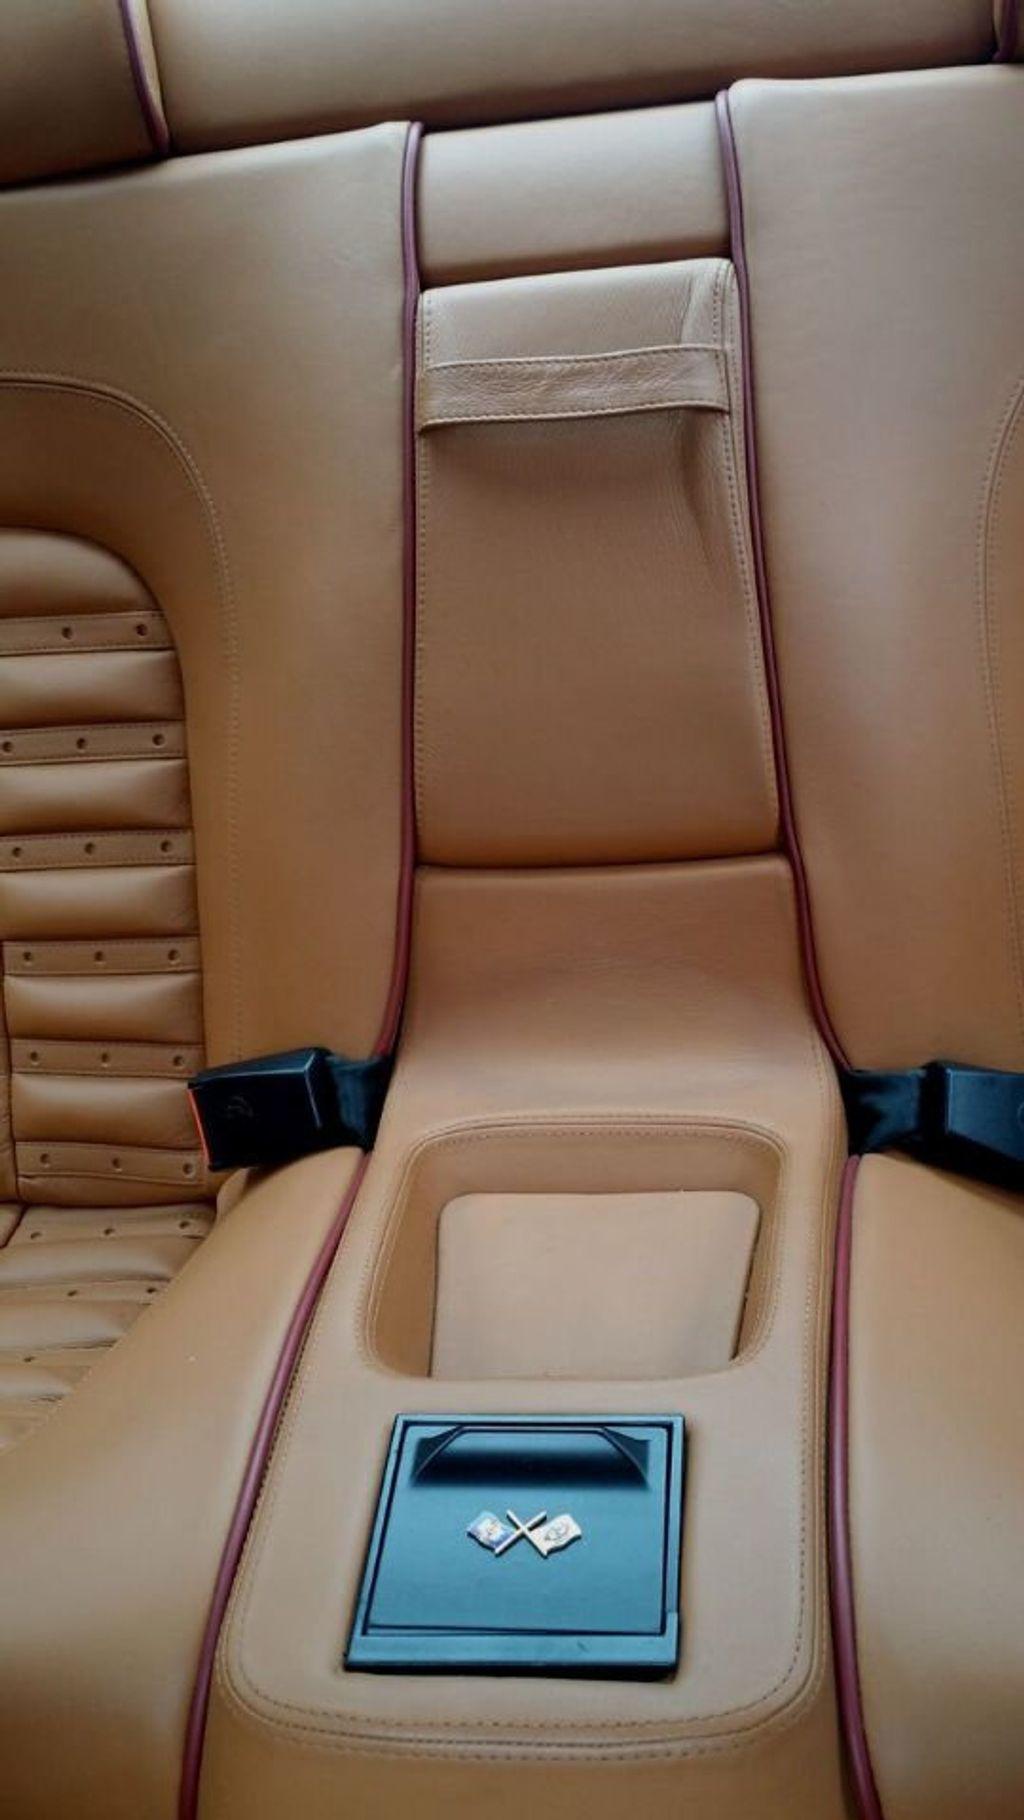 2000 Ferrari 456 456M GTA - 16672991 - 15